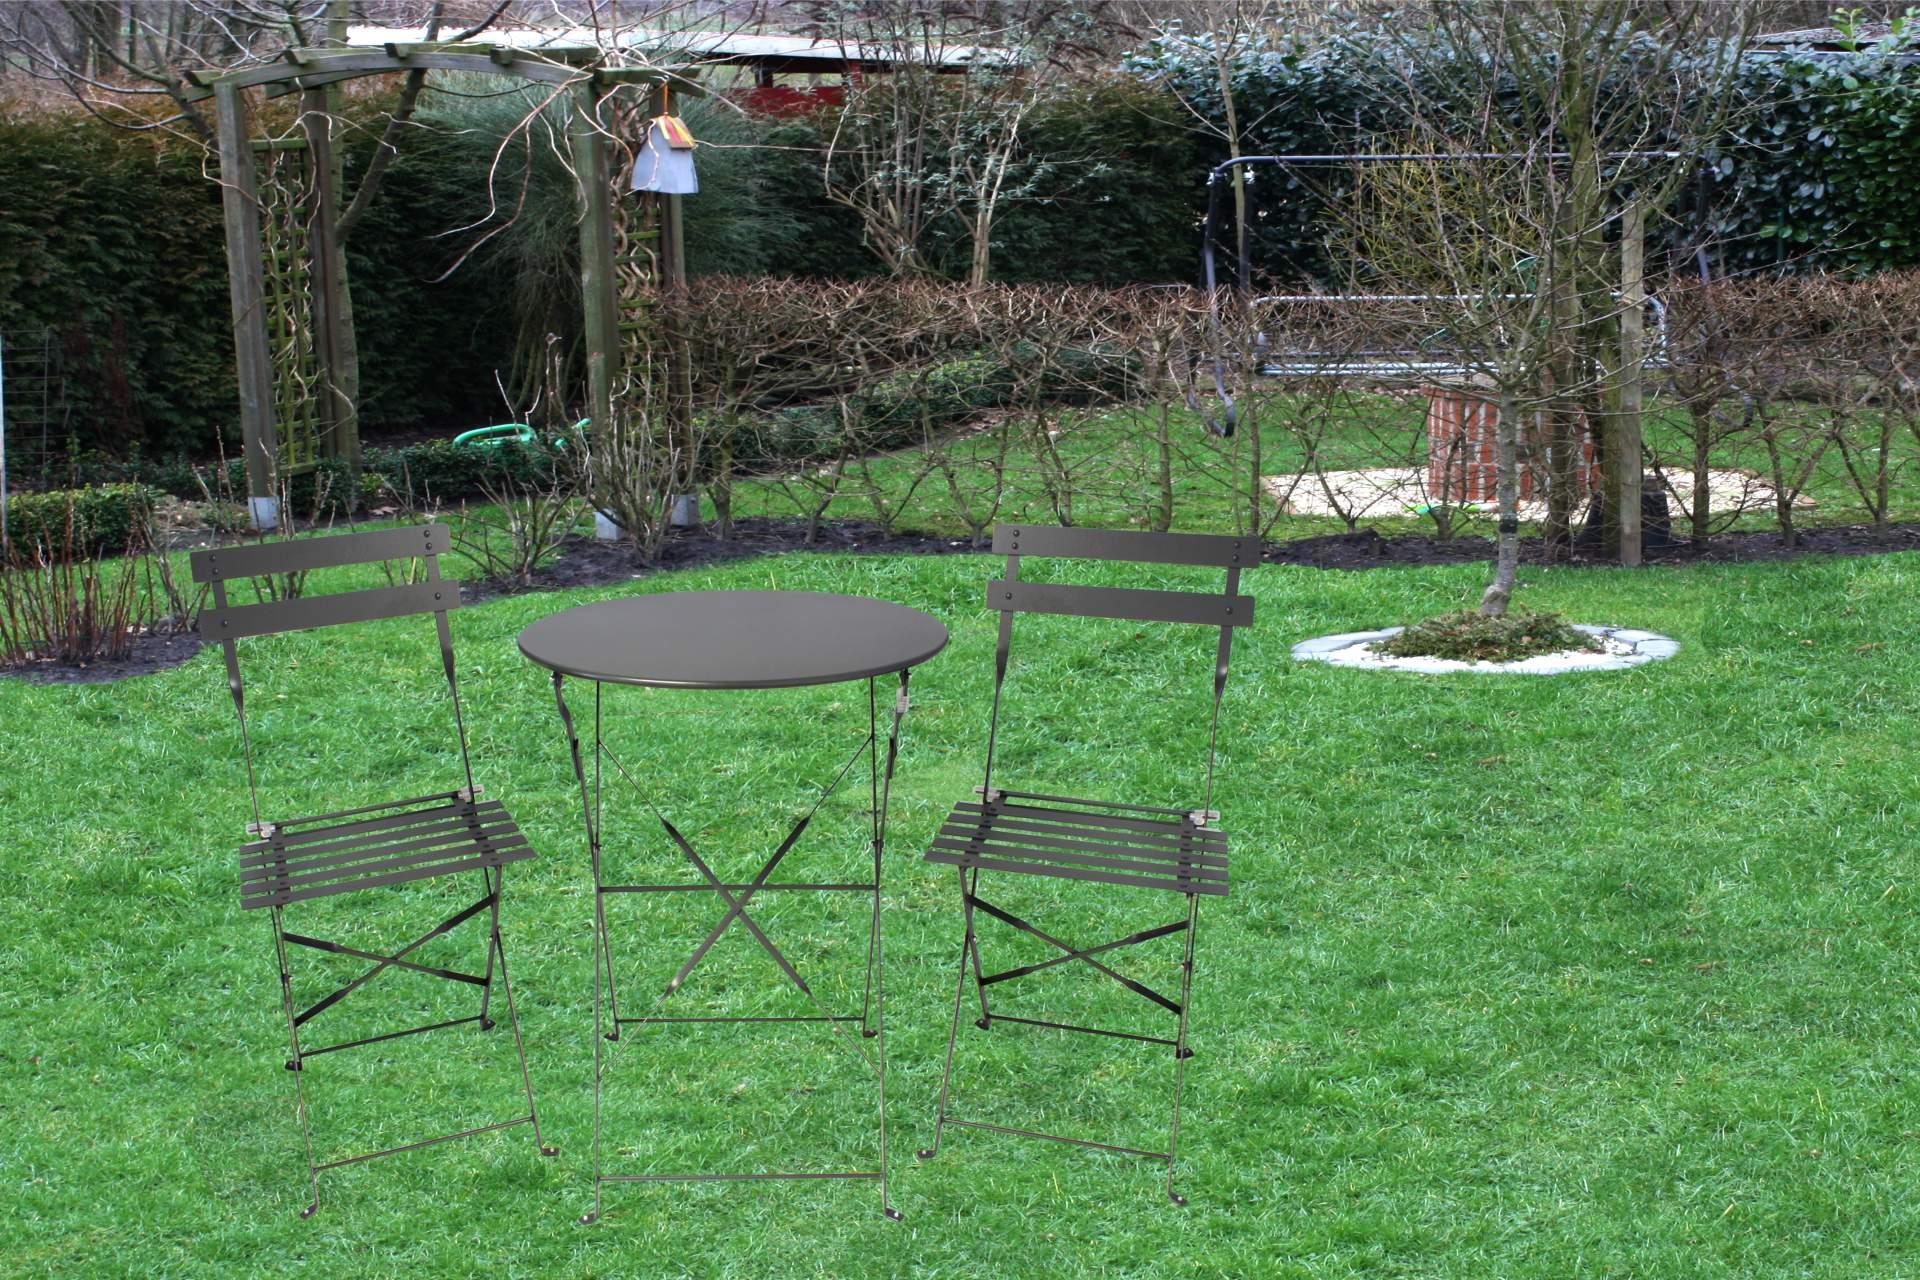 bistro set garnitur kynast 3 tlg anthrazit metallgestell stuhl tisch klappbar ebay. Black Bedroom Furniture Sets. Home Design Ideas